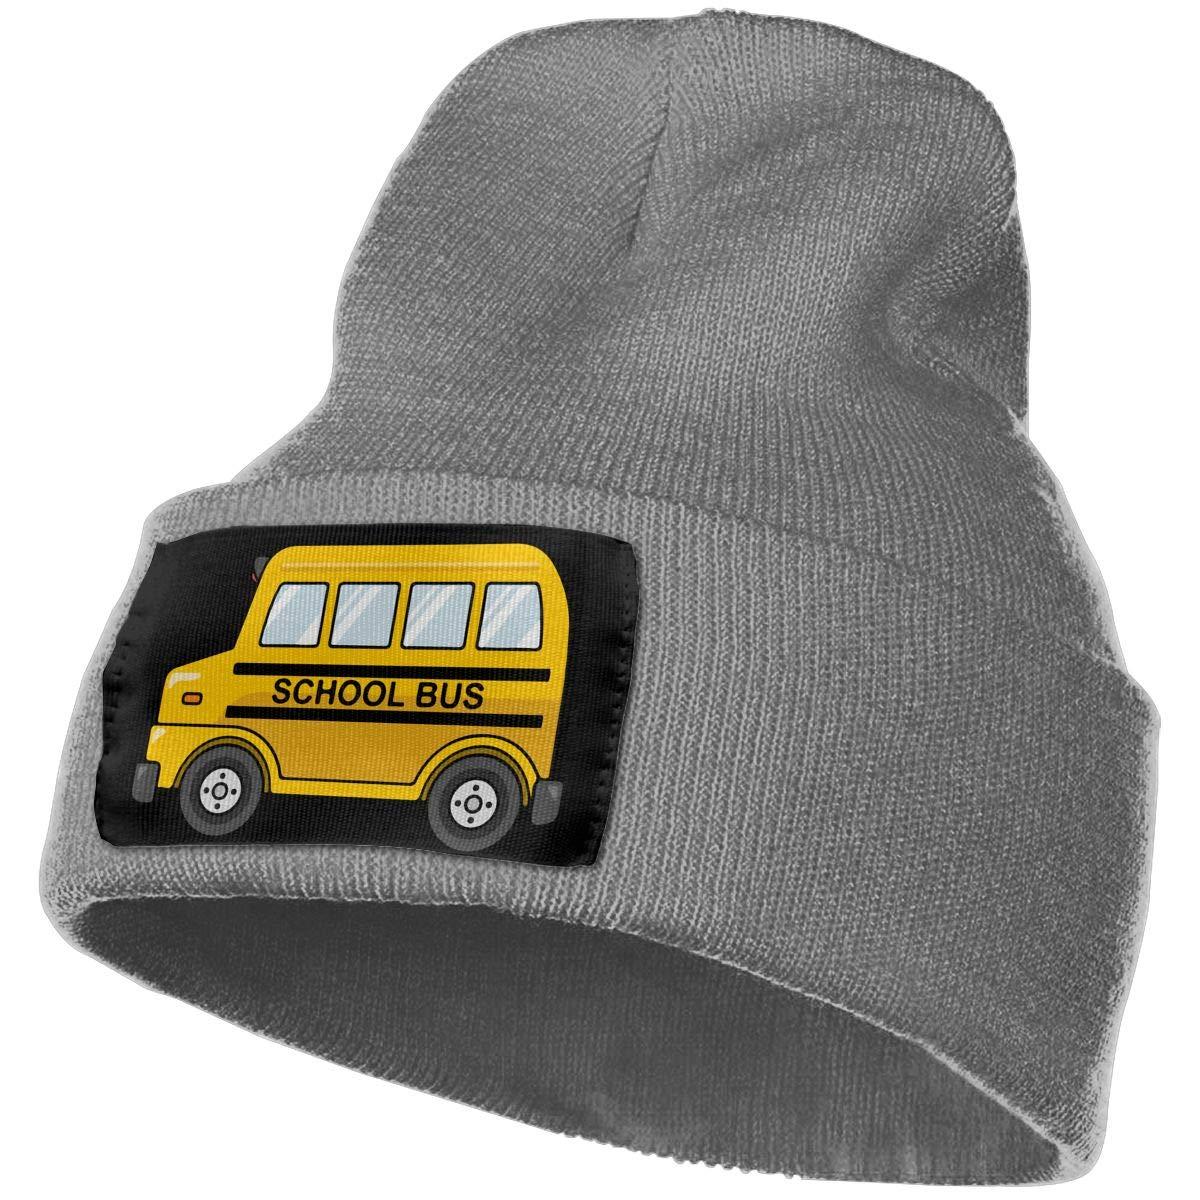 School Bus Beanie Cap Hat Men /& Women Knit Hats Stretchy /& Soft Beanie